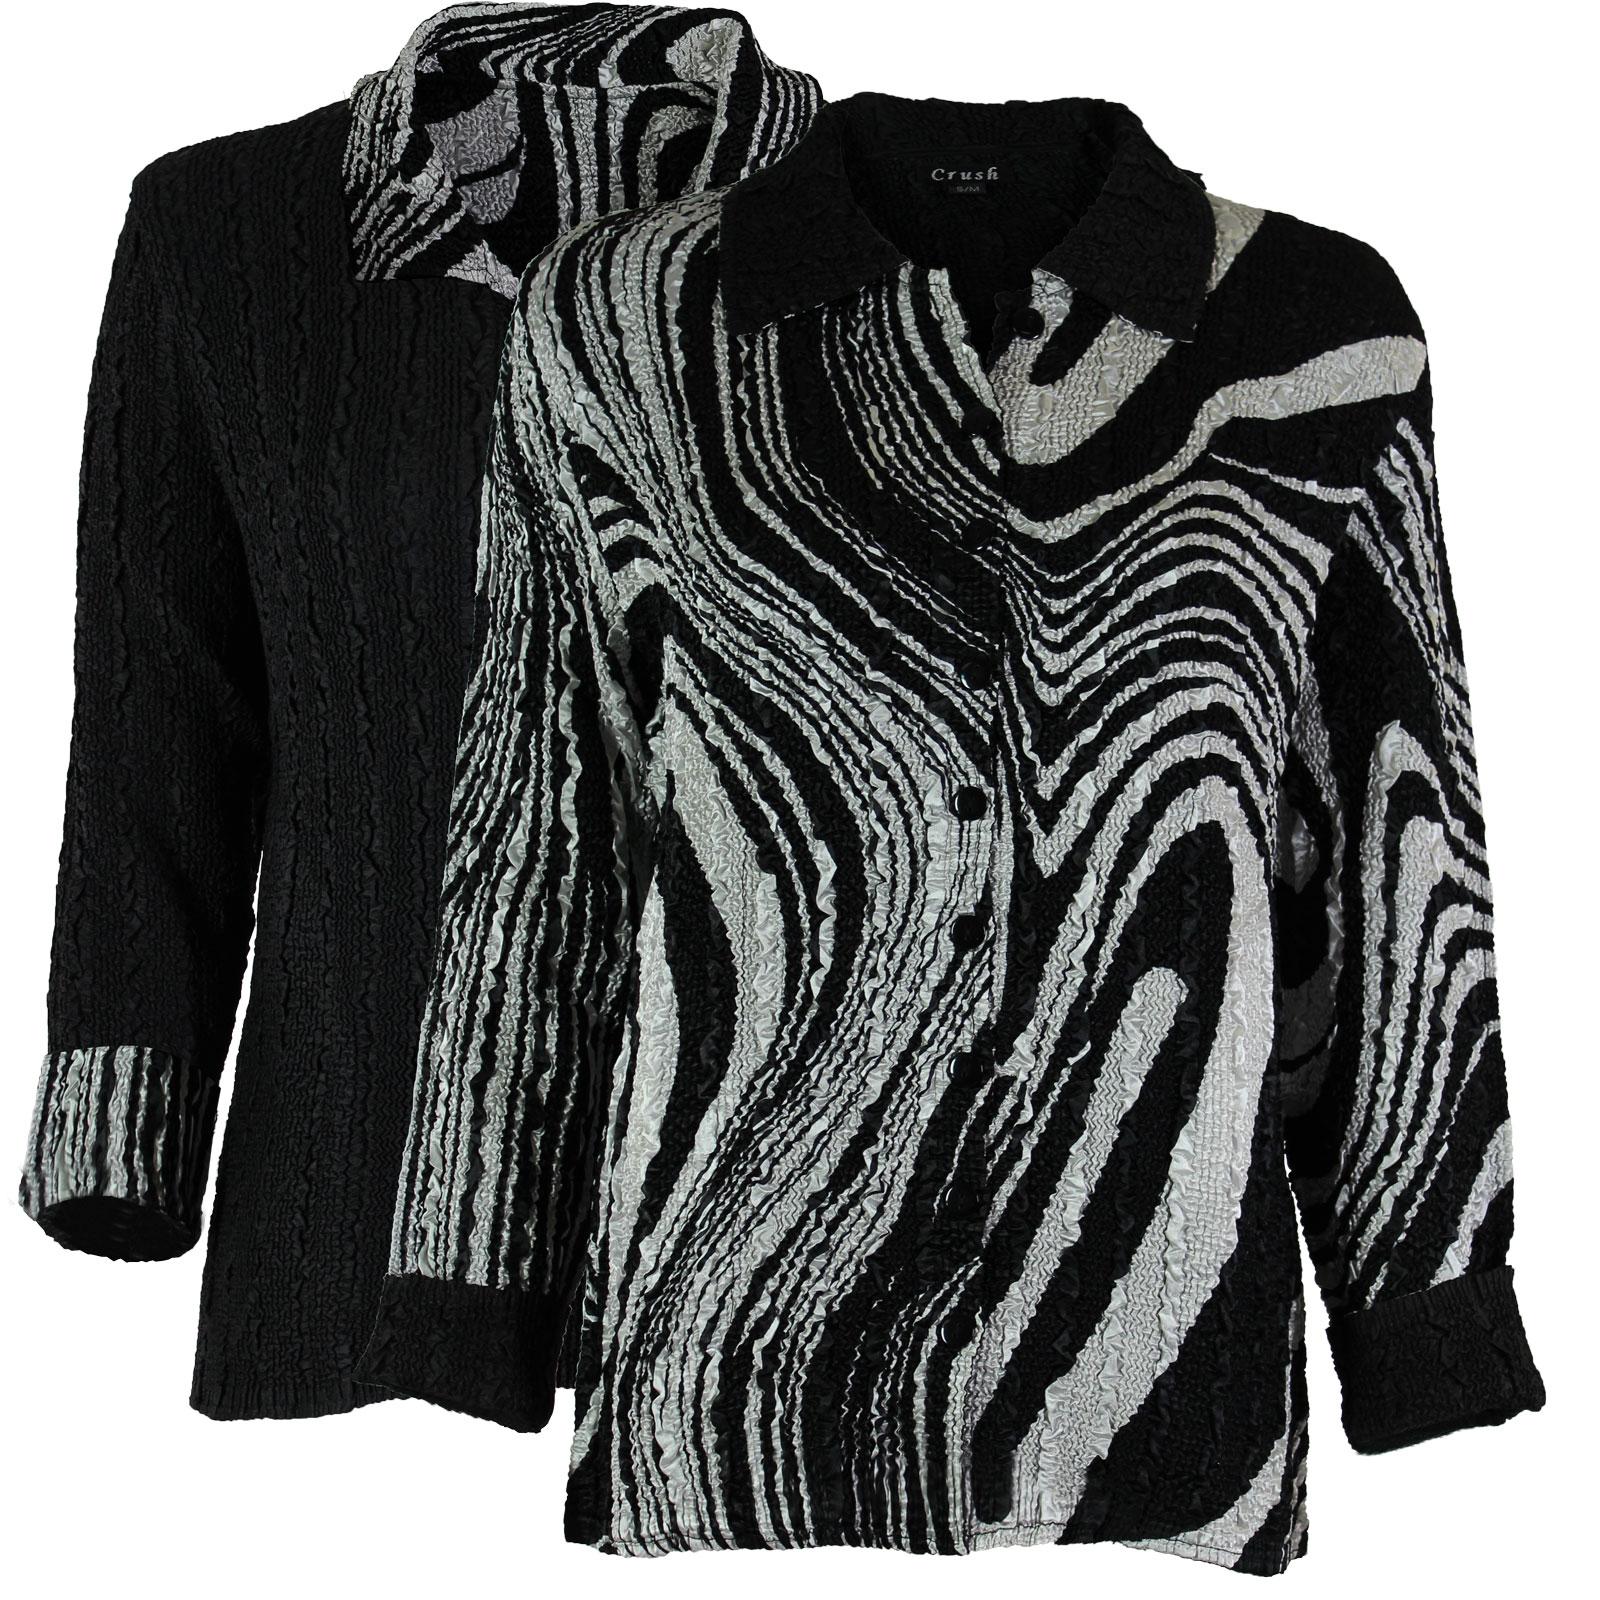 Wholesale Magic Crush - Reversible Jackets #14011 Black and White Swirl  -      S-M